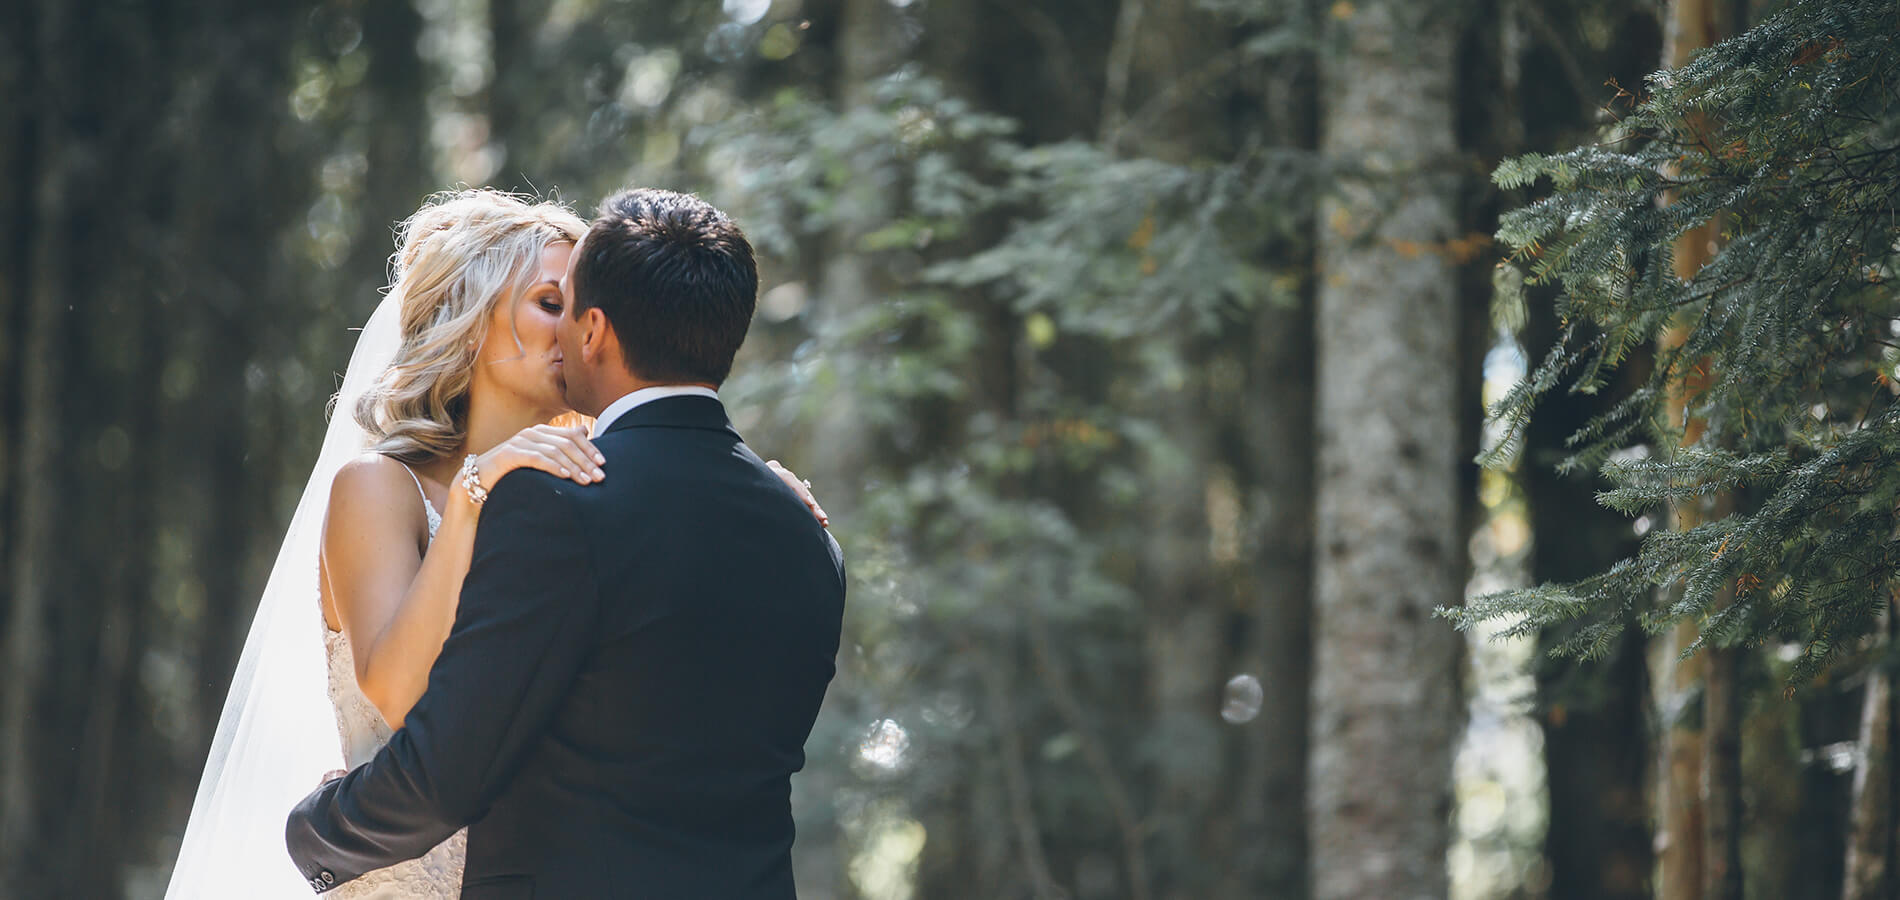 Weddings_BottomMenu_BG.jpg